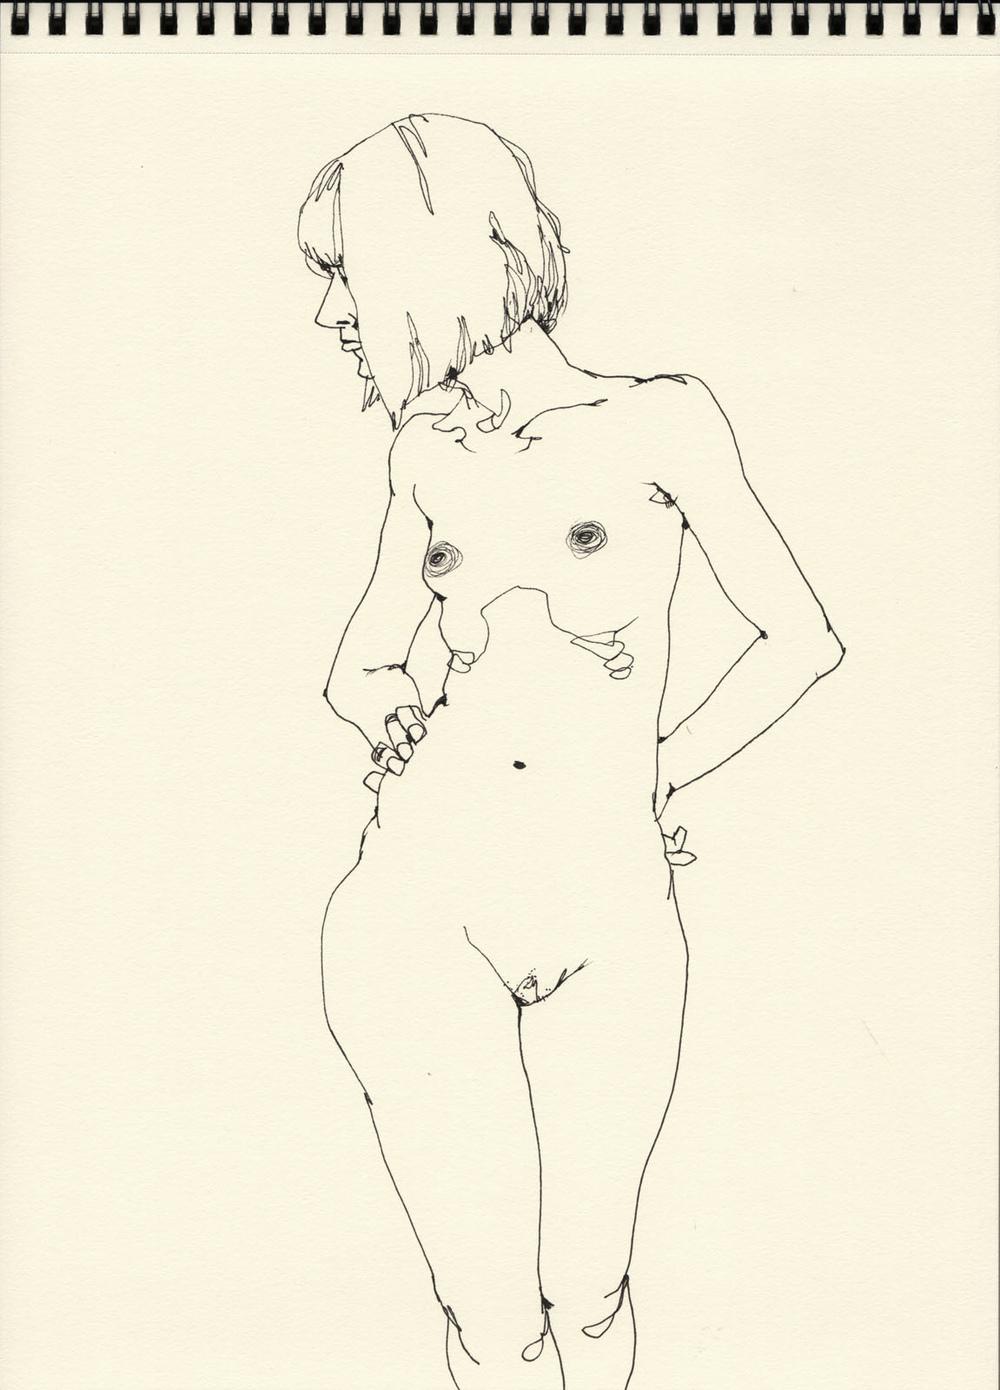 the-tree-mag-drawings-by-lu-cong-50.jpg